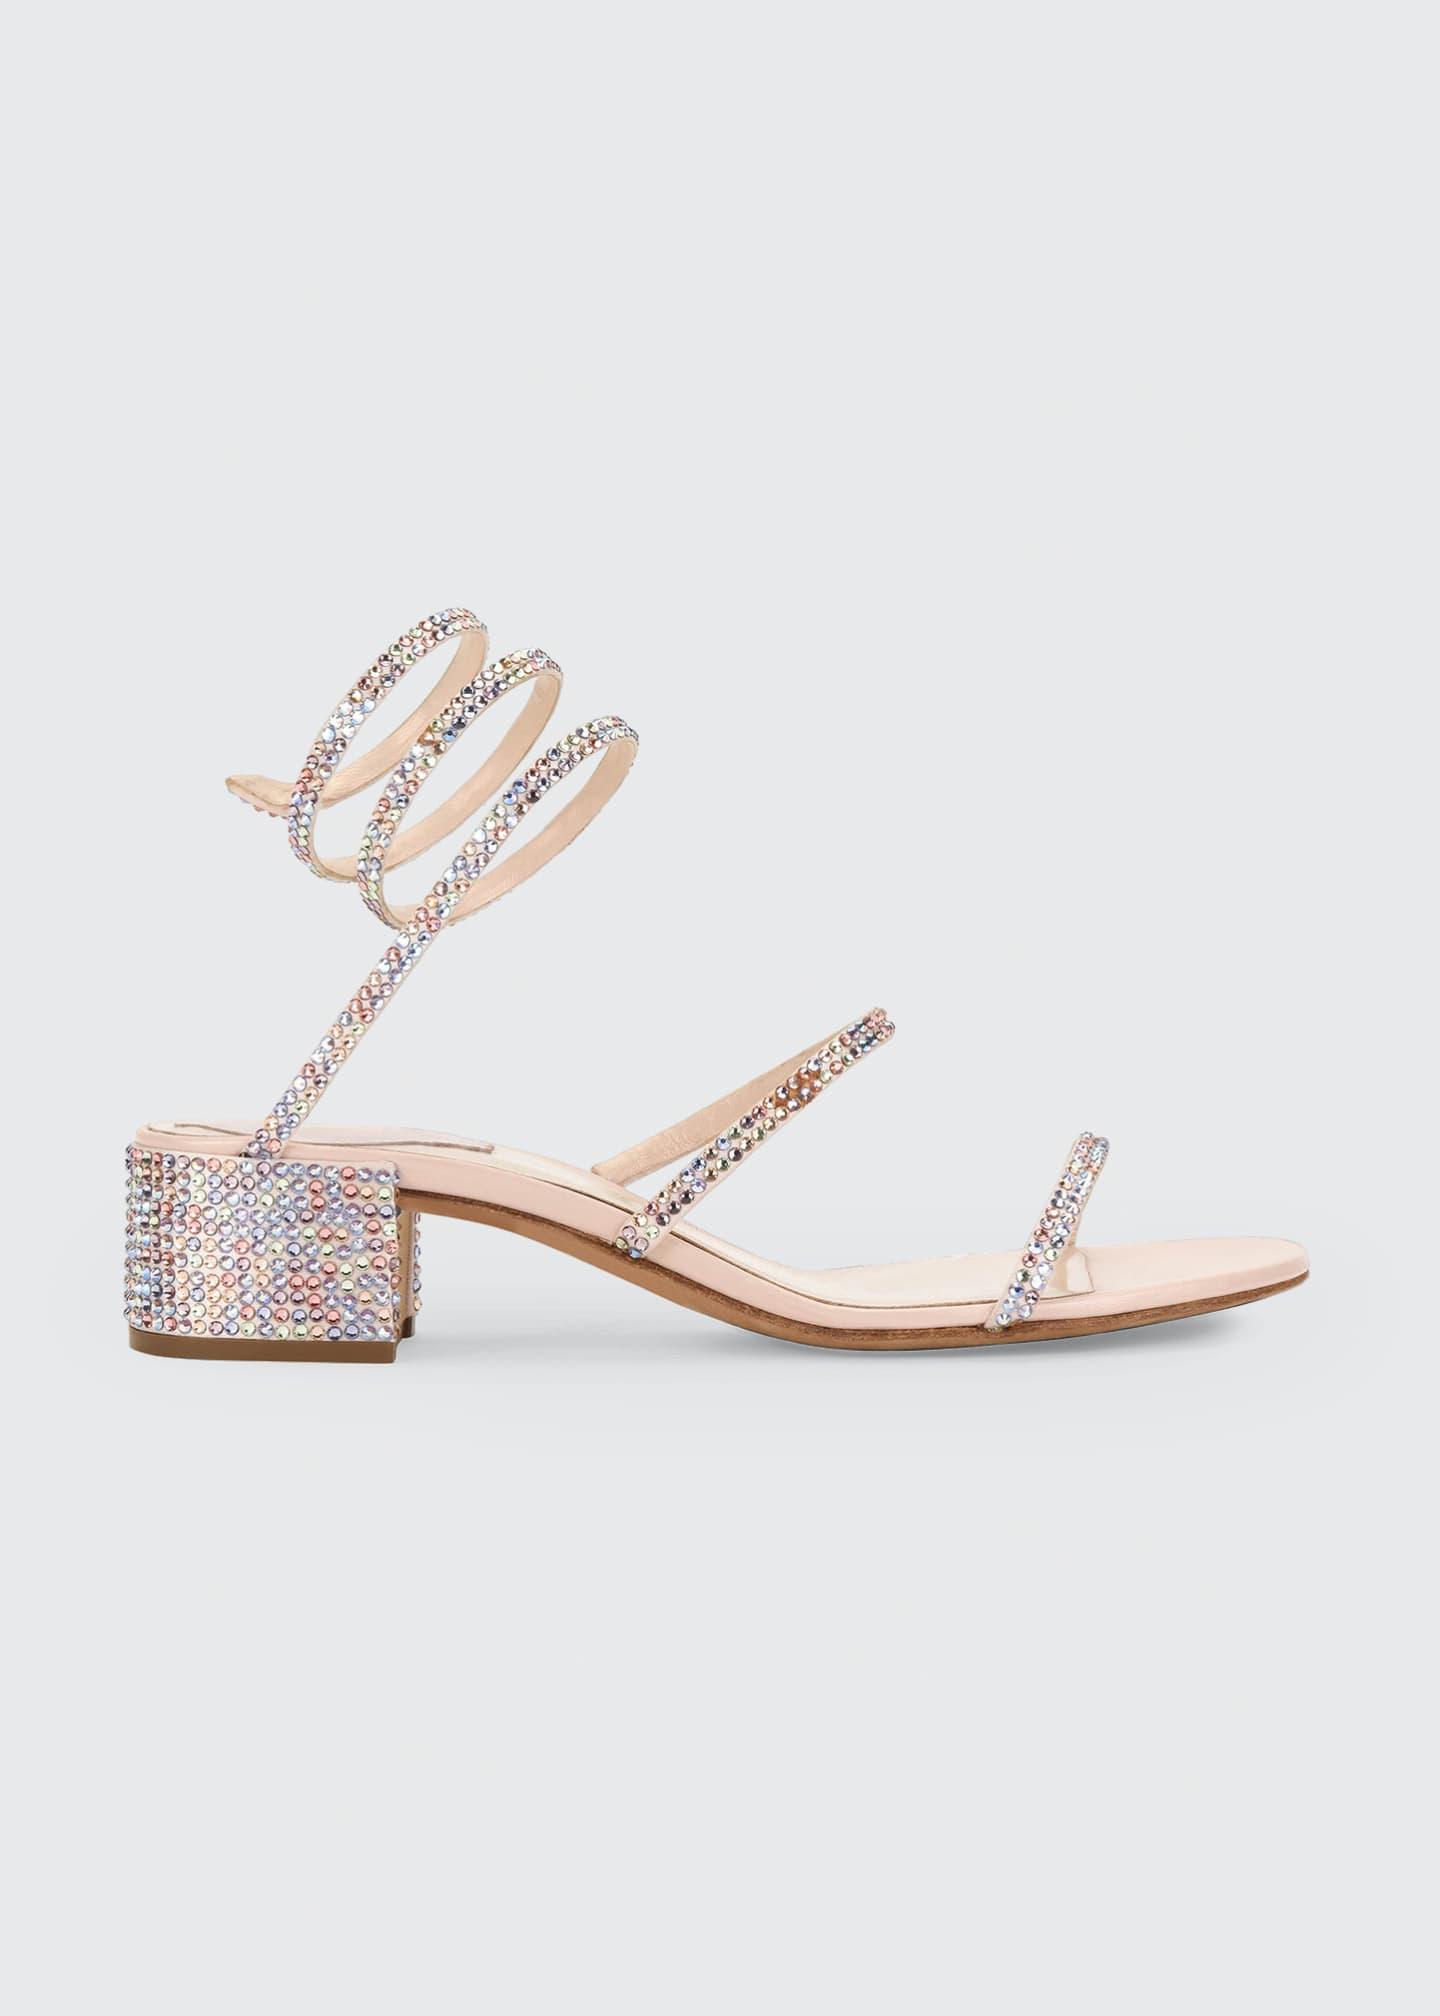 Rene Caovilla Crystal Snake 40mm Sandals